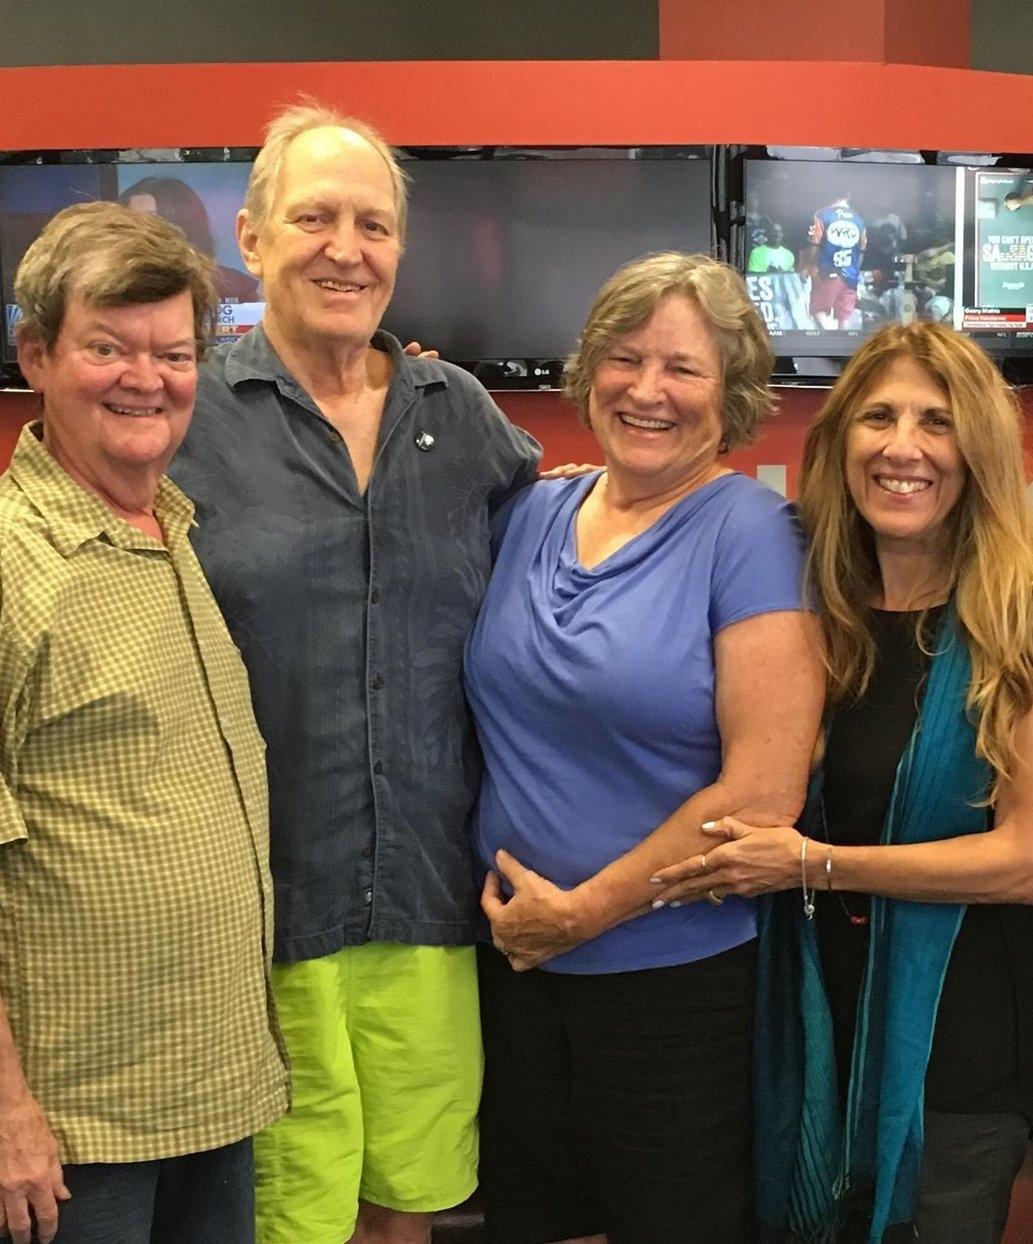 From Left to Right: Thom Clarke, Michael James, Katy Hogan, Lynn Orman Weiss